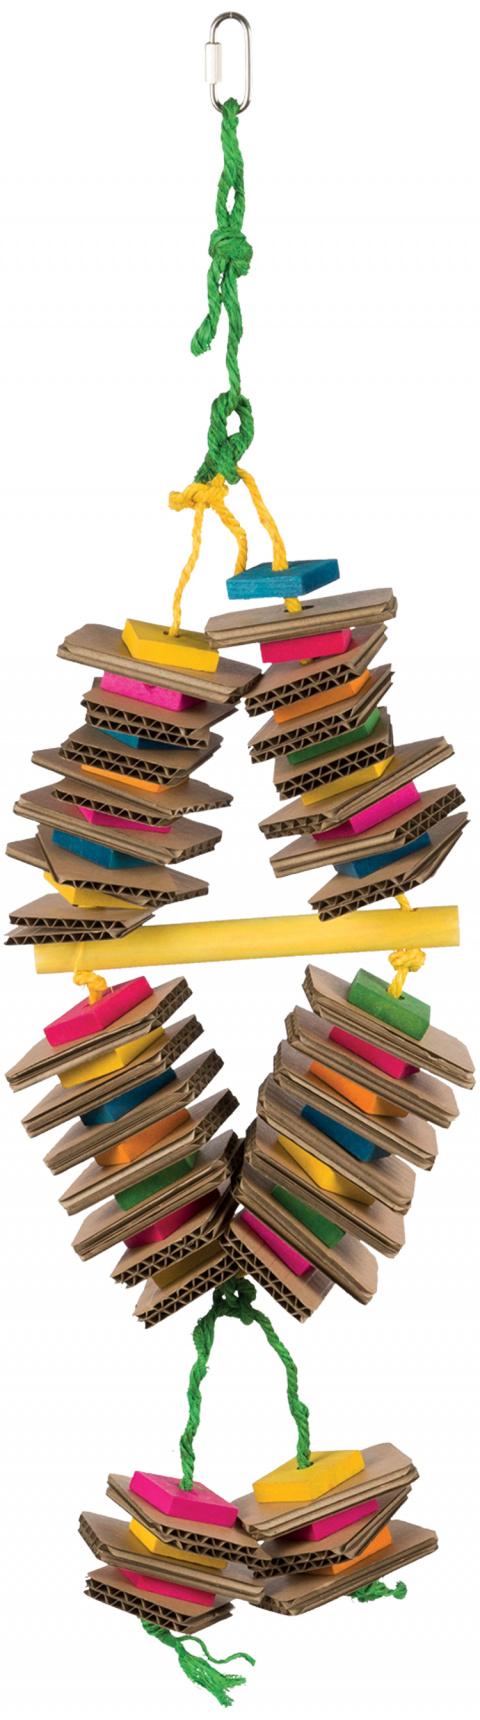 Rotaļlieta putniem - TRIXIE Wooden Toy with Sisal Rope, Colourful, 18*35 cm